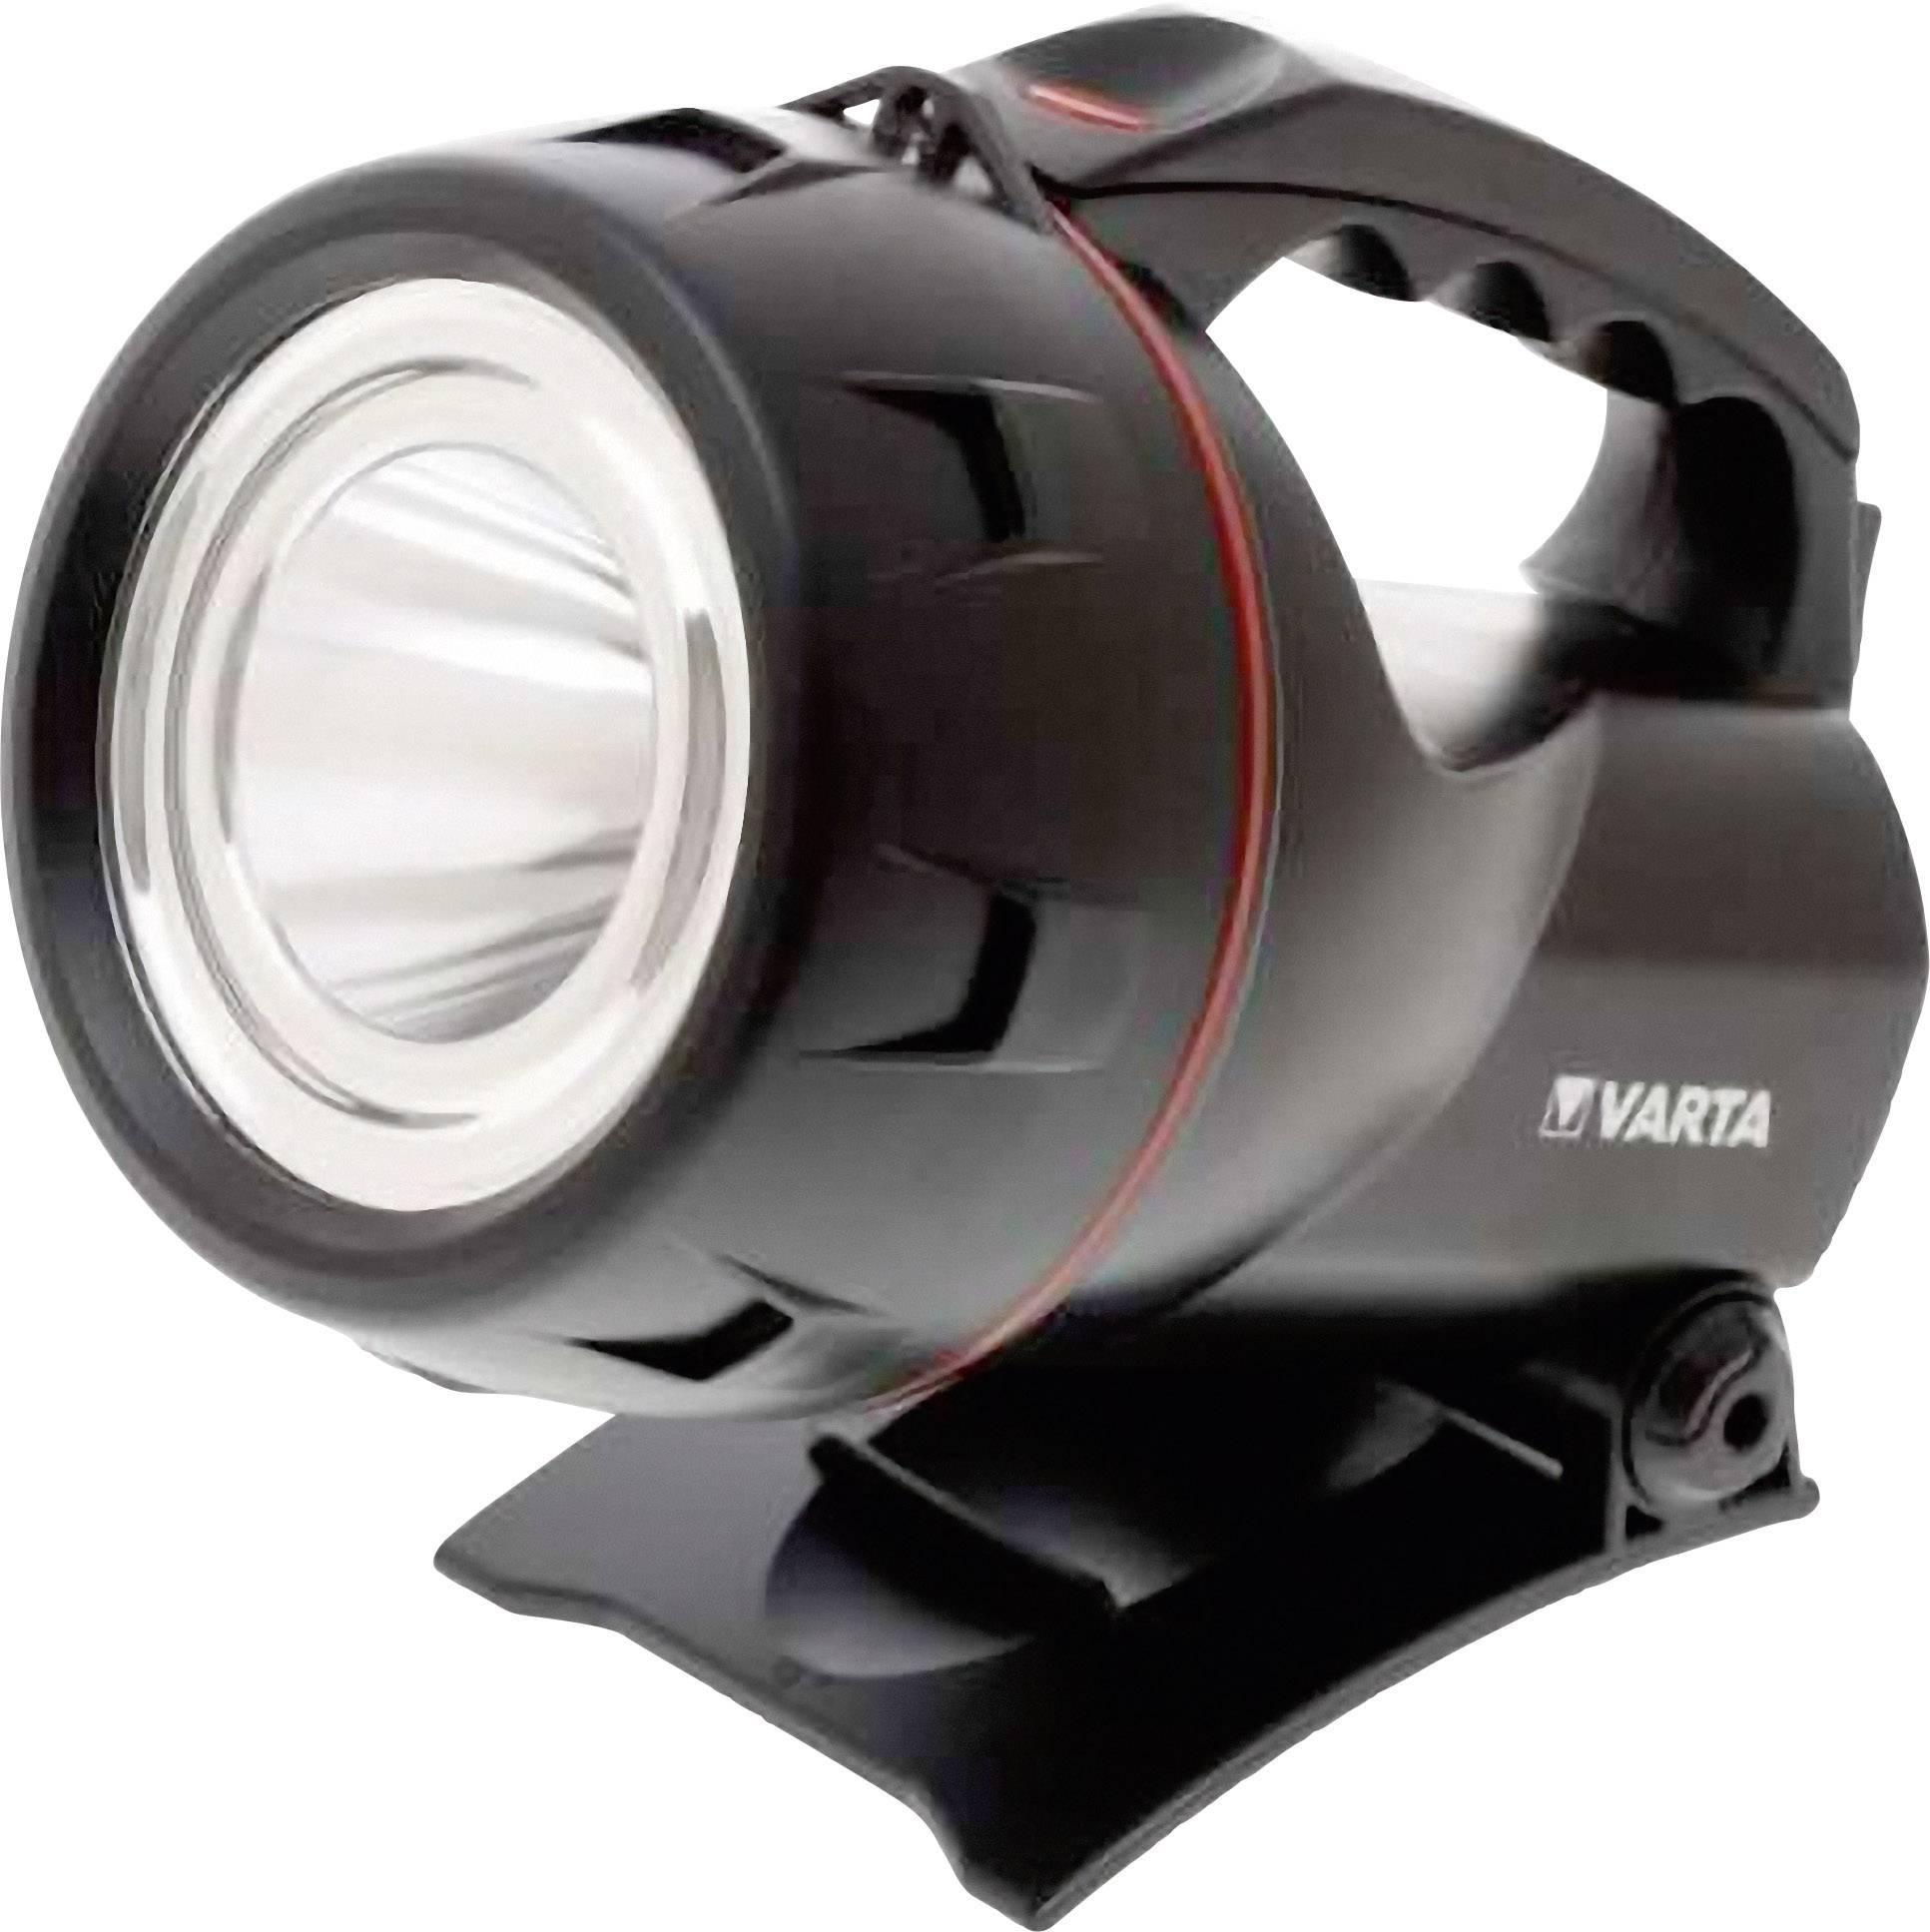 Ručné akumulátorové svietidlo (baterka) Varta 18682101401, čierna